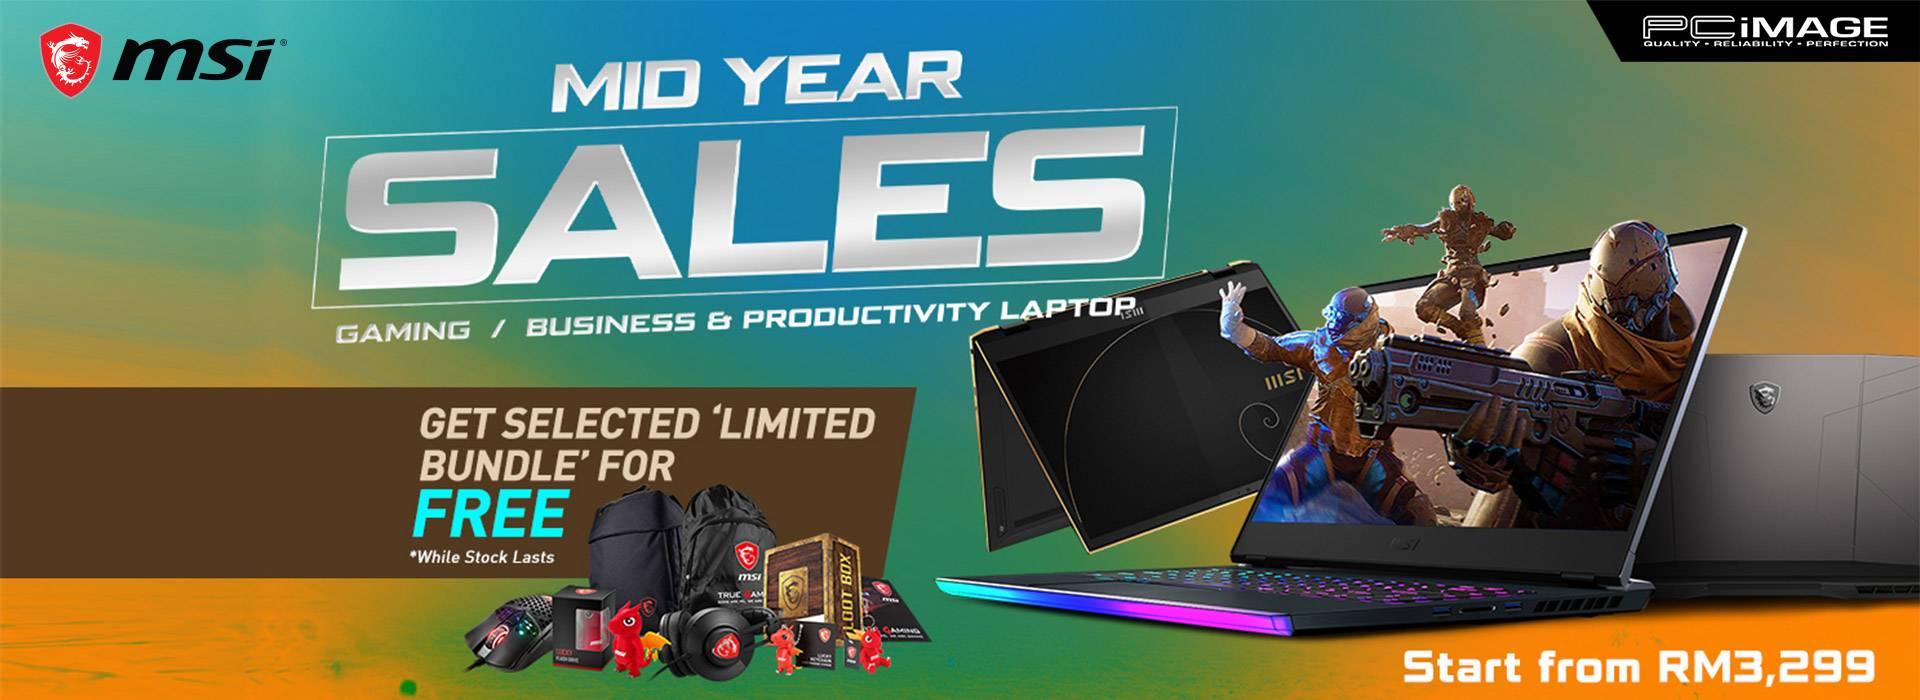 Msi Mid Year Sales 31 July